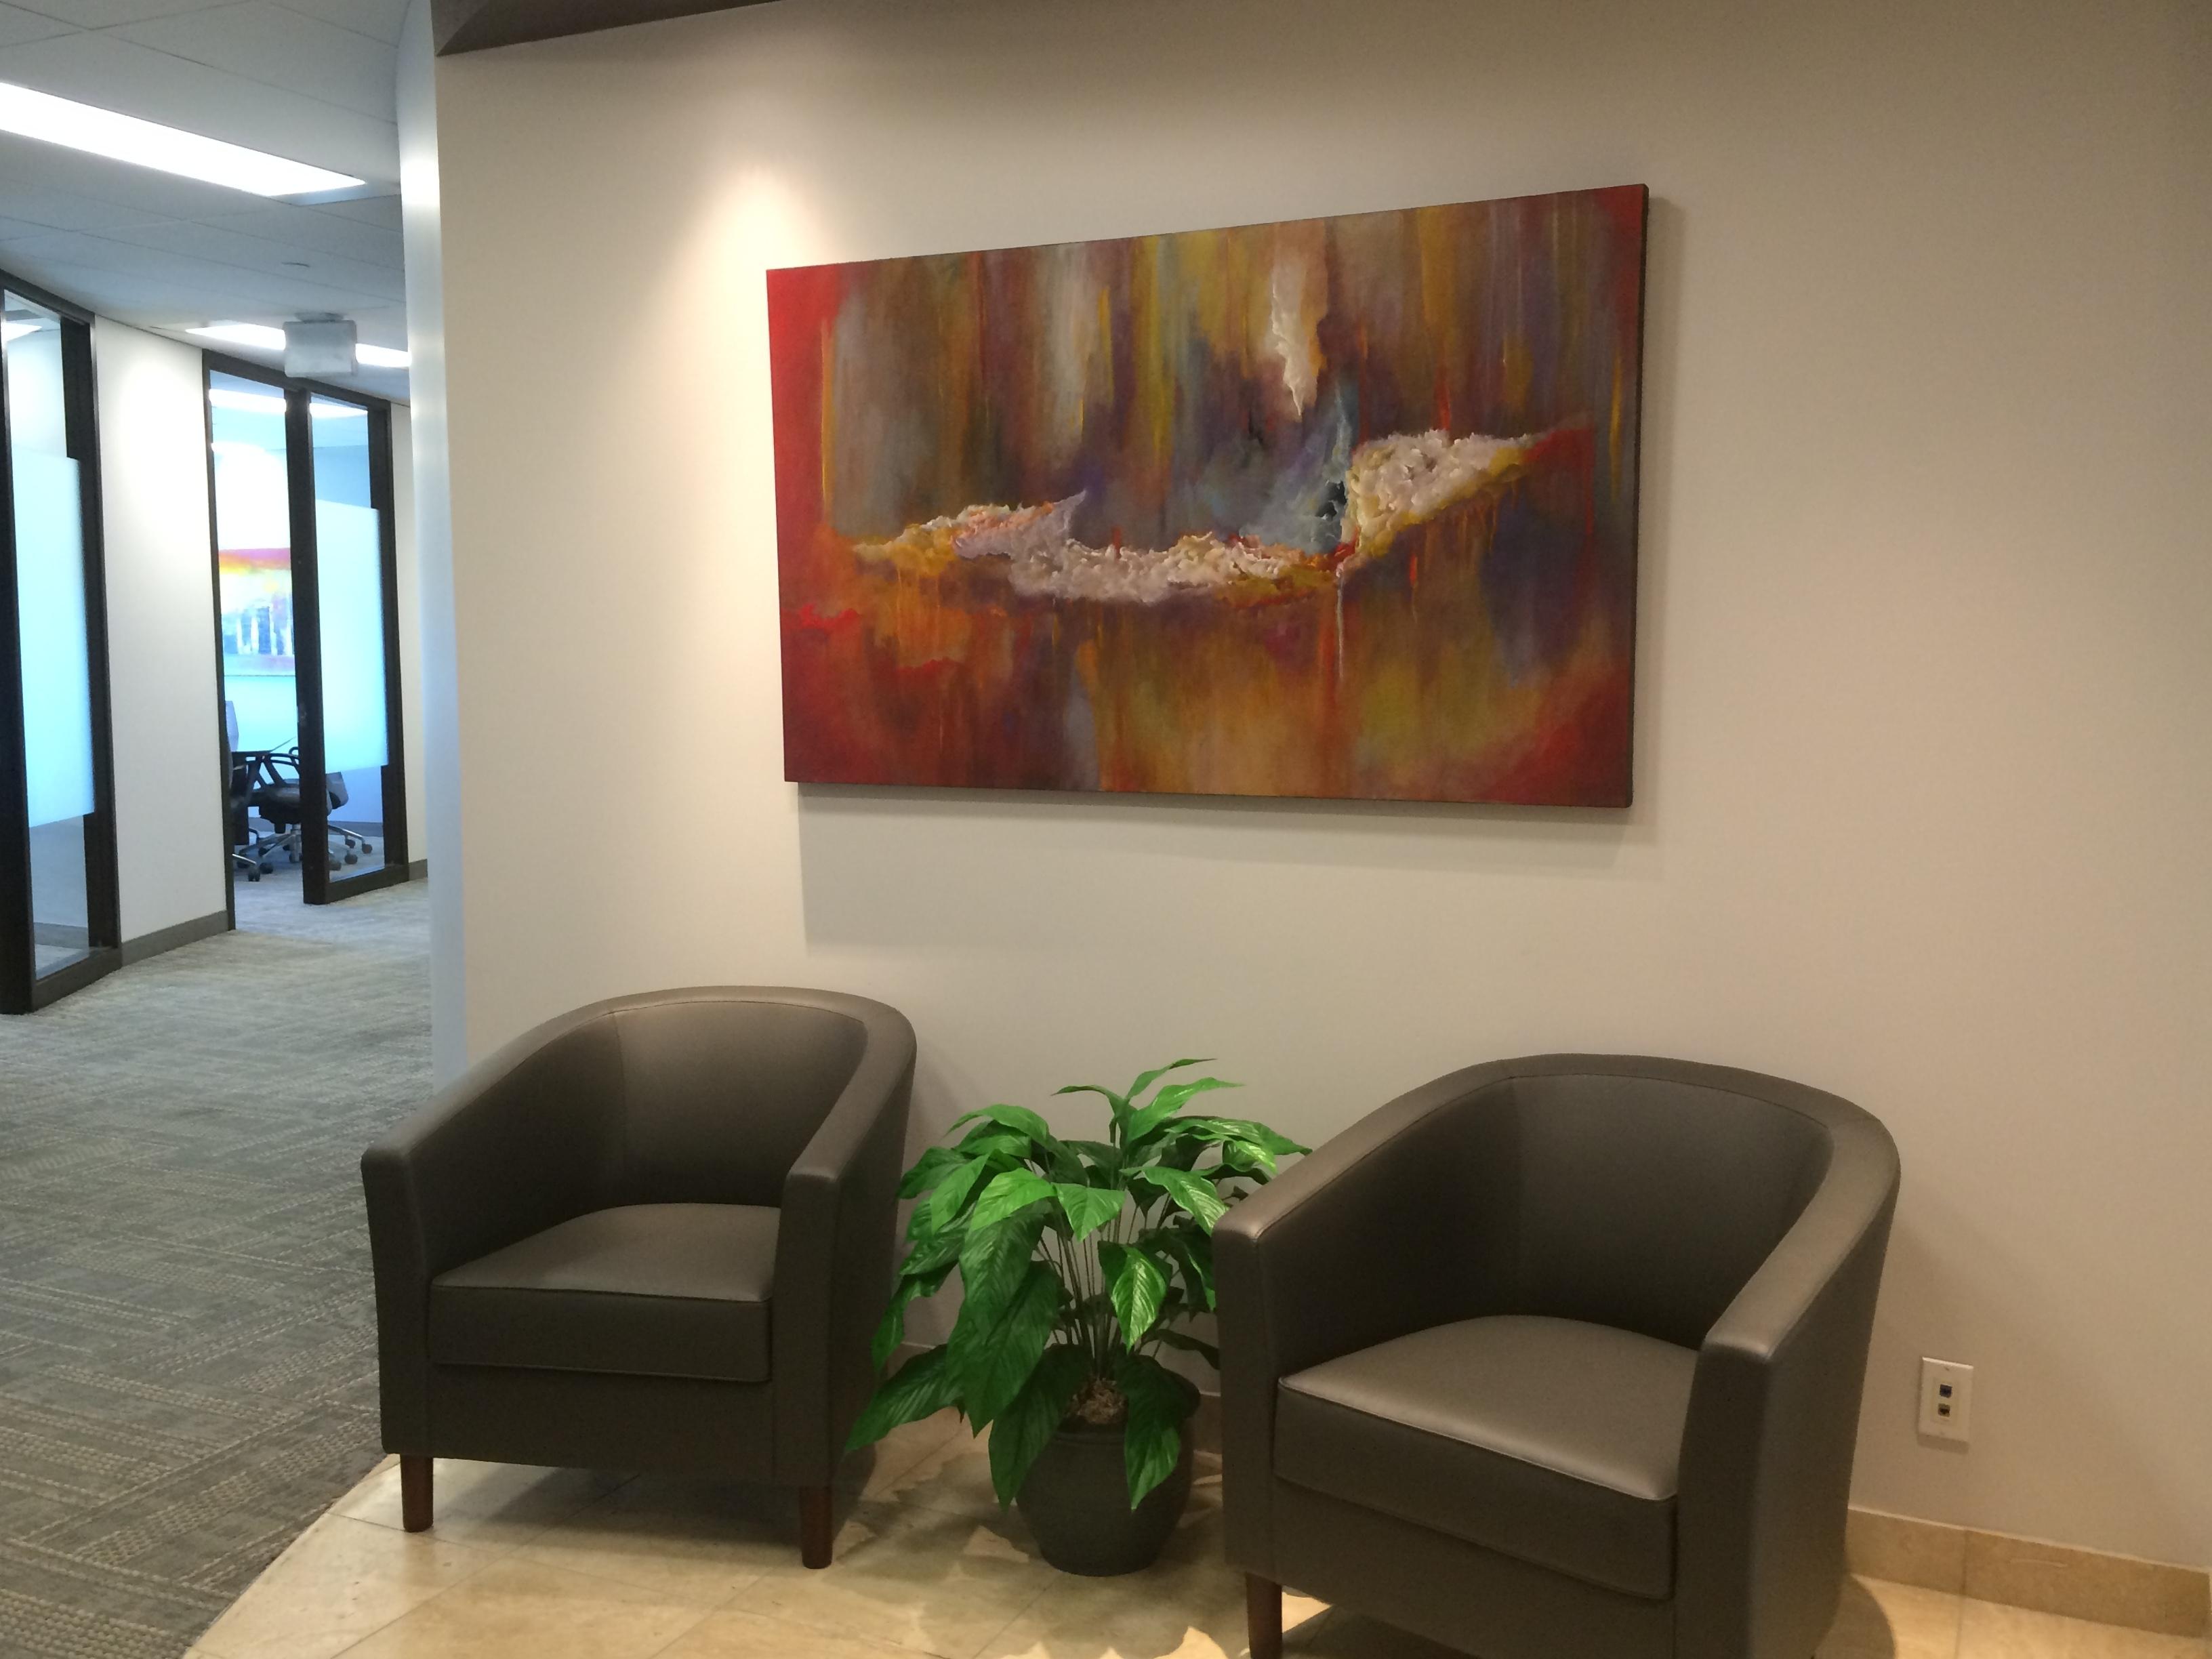 Office Lobby, Artworksoraya Silvestri (View 13 of 20)